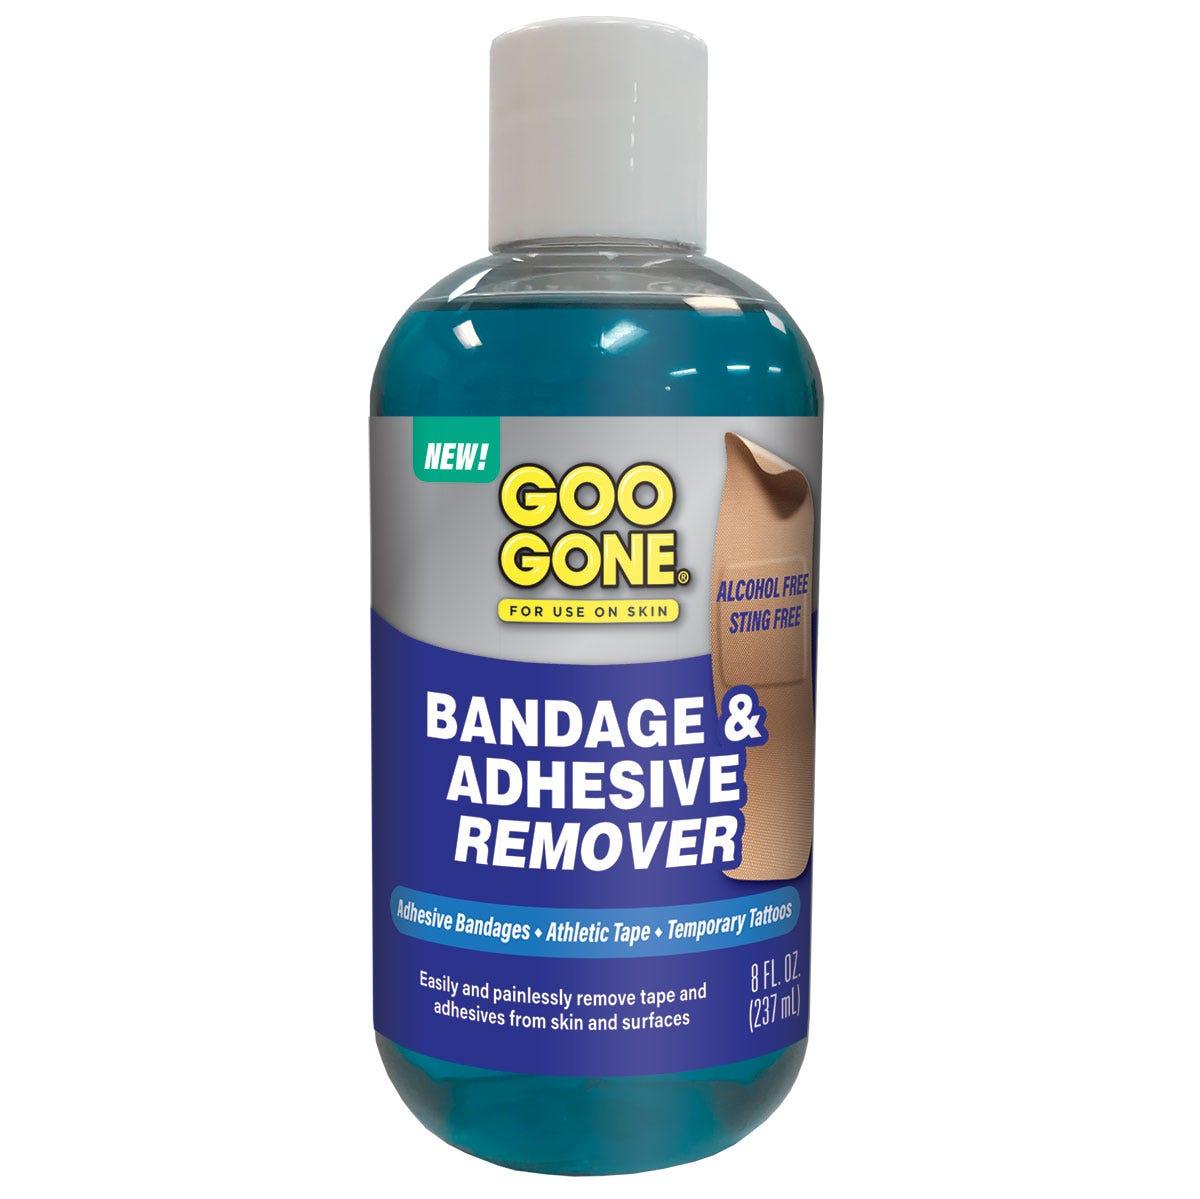 Bandage & Adhesive Remover